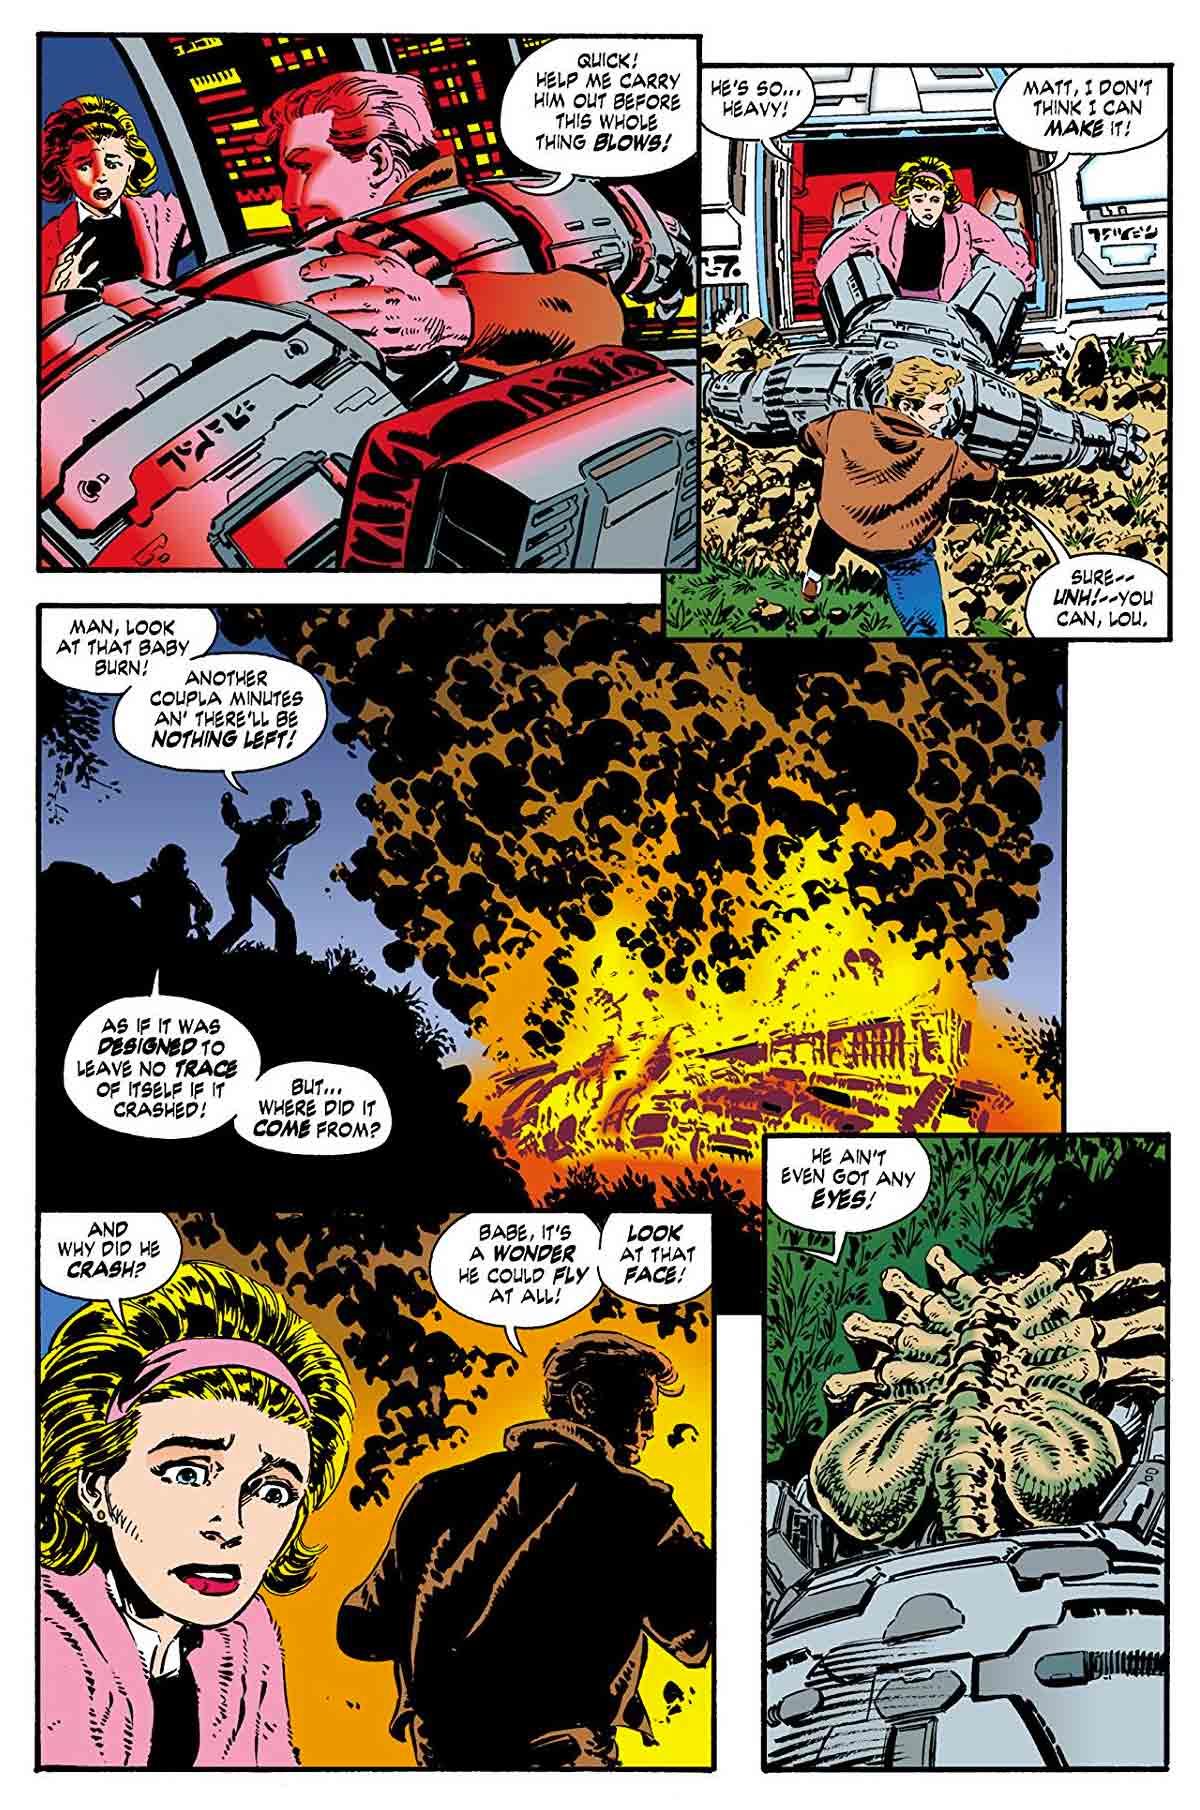 Golem-Comics-Aliens-Earth-Angel-John-Byrne-05